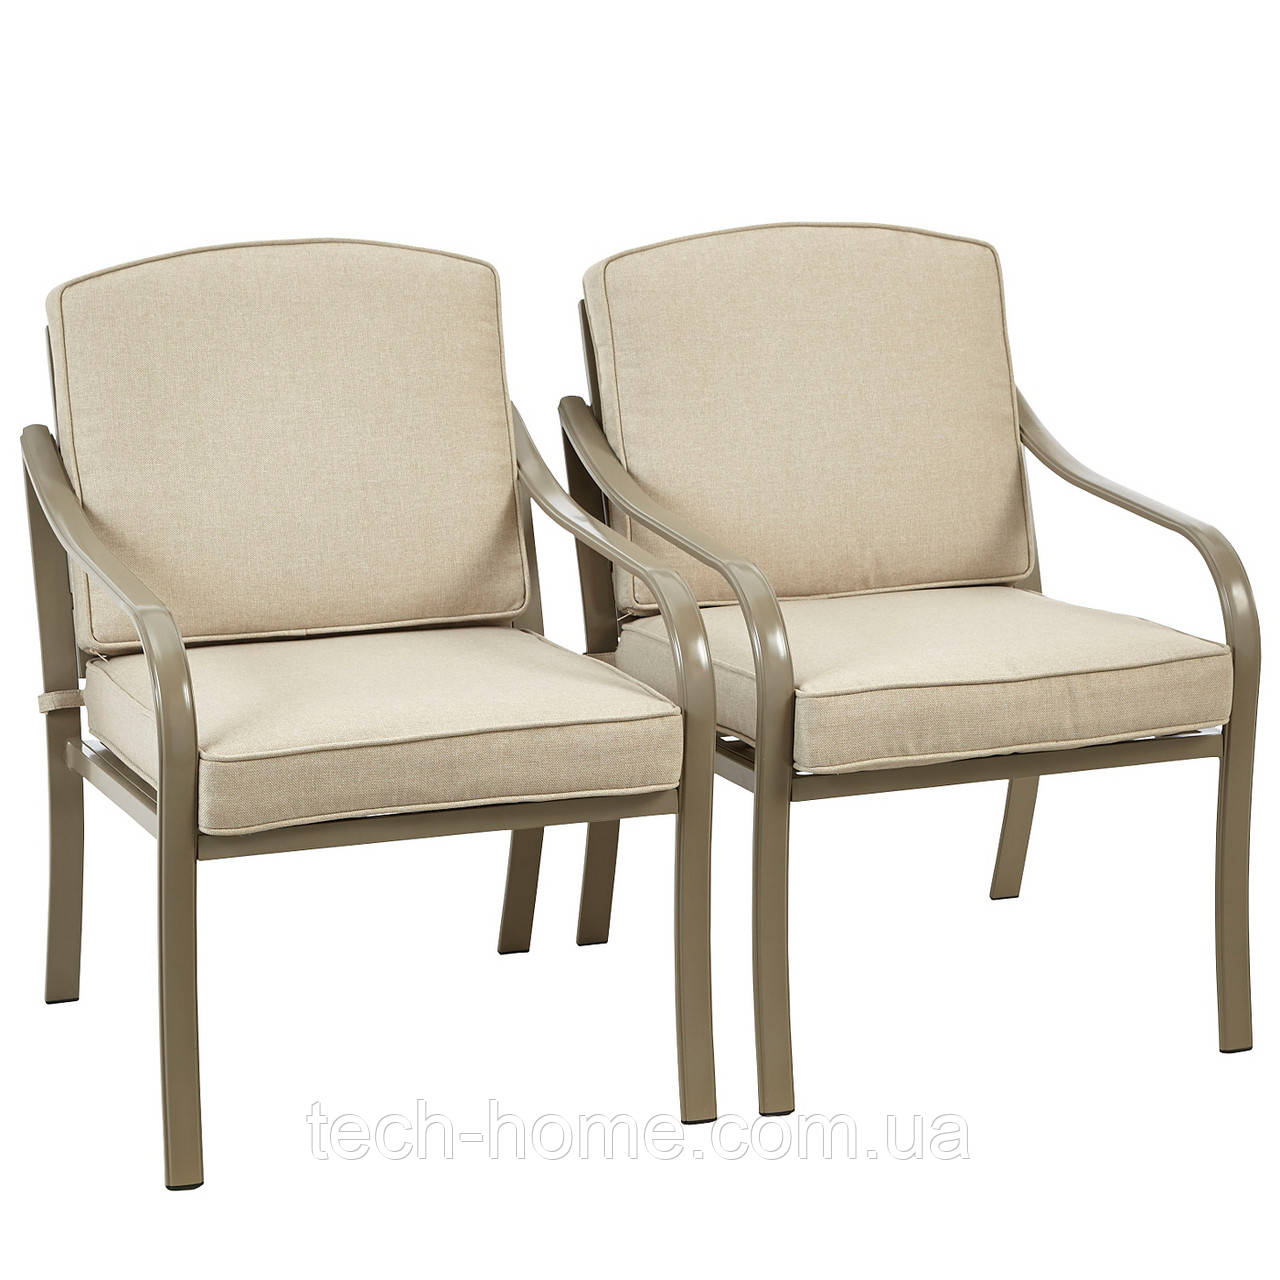 Набір садових стільців George Home 2 Haversham Classic Dining Chairs Linen